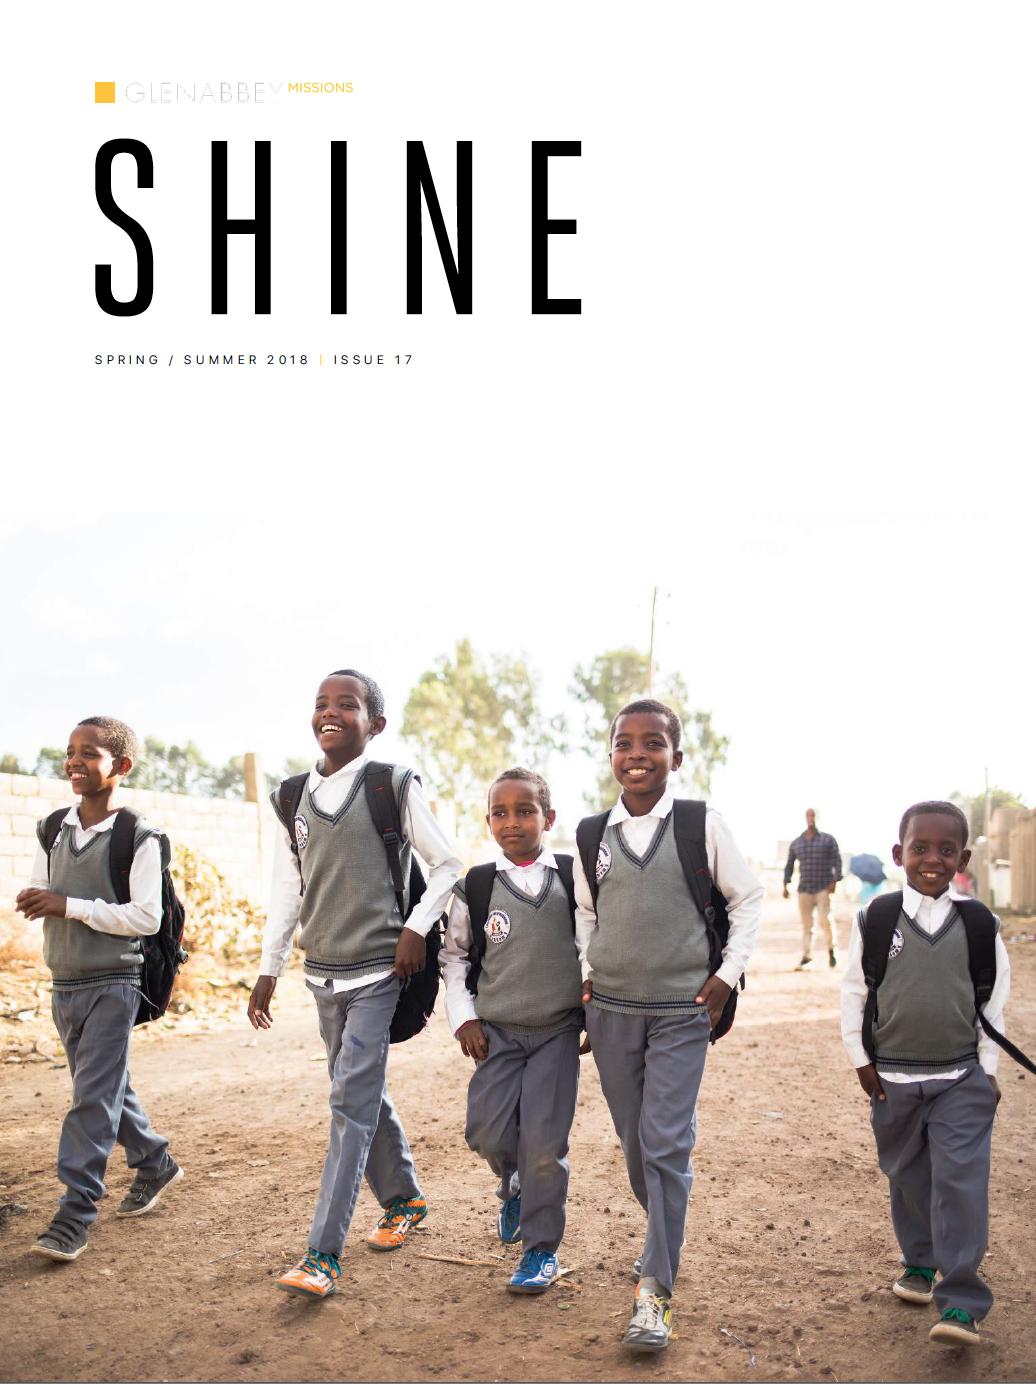 Shine Issue 17 - Spring / Summer 2018